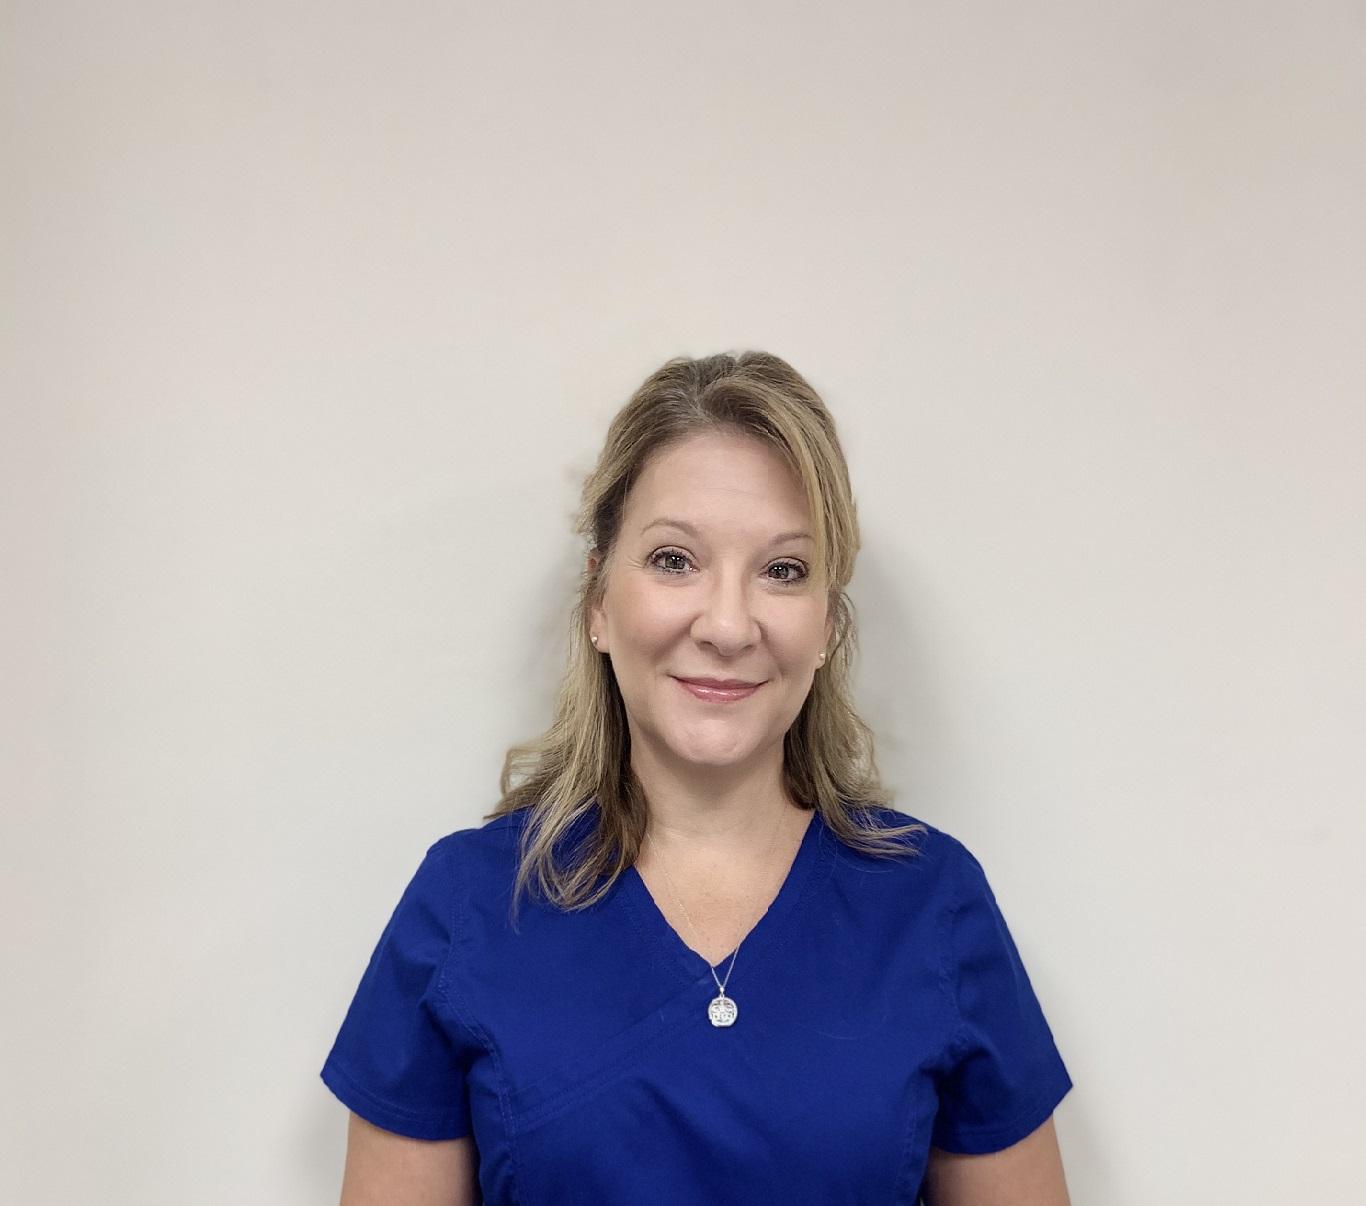 Tara Estay Joins Amite Rural Health Clinic